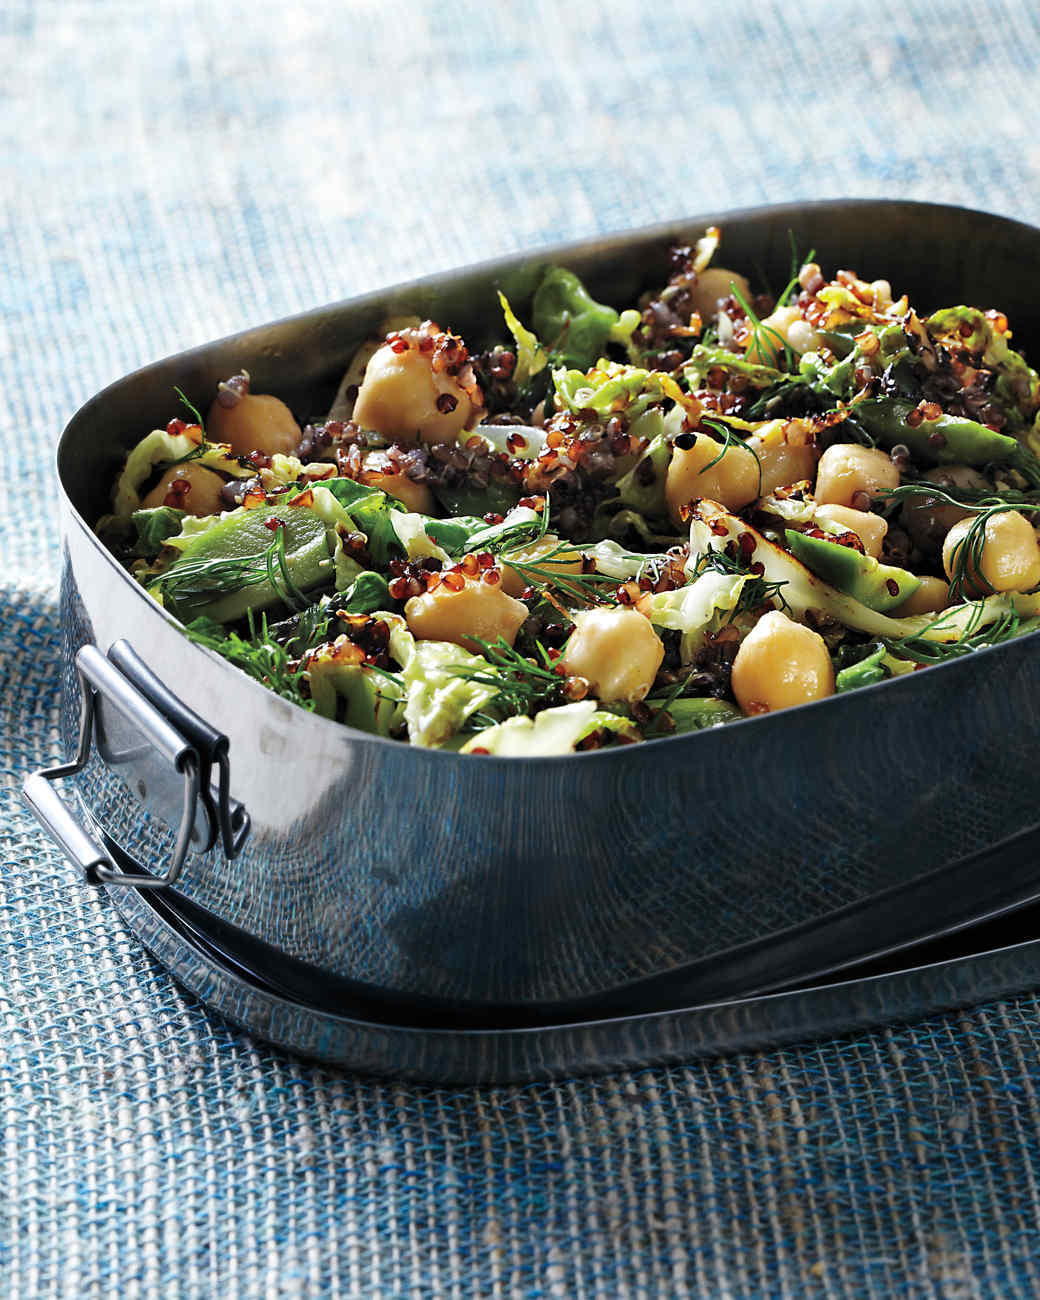 toasted-quinoa-saute-lemony-cabbage-dill-md109634.jpg